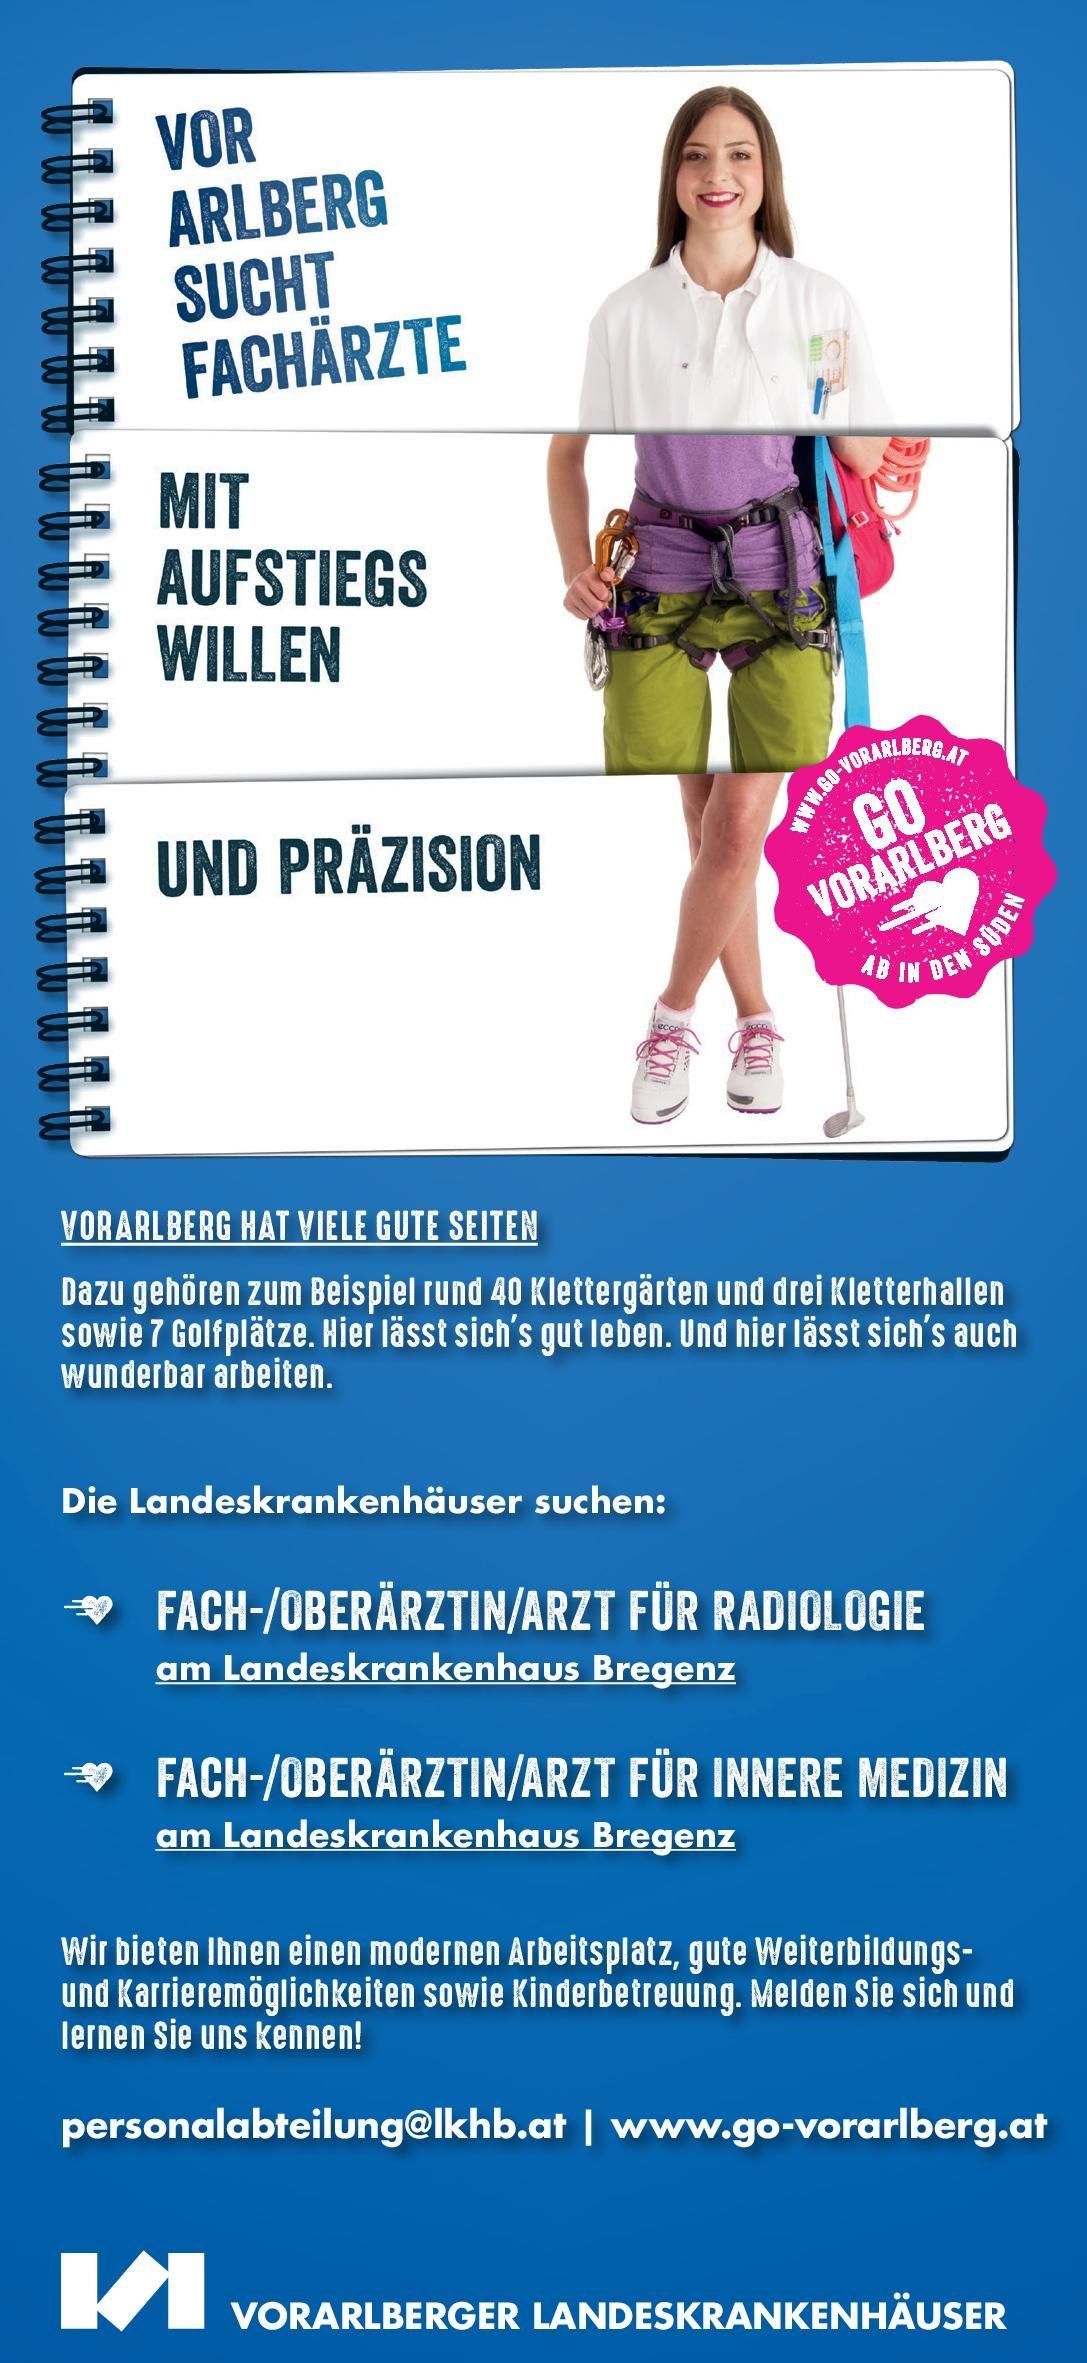 Landeskrankenhaus Bregenz Fach-/Oberärztin/arzt Innere Medizin  Innere Medizin, Innere Medizin Arzt / Facharzt, Oberarzt